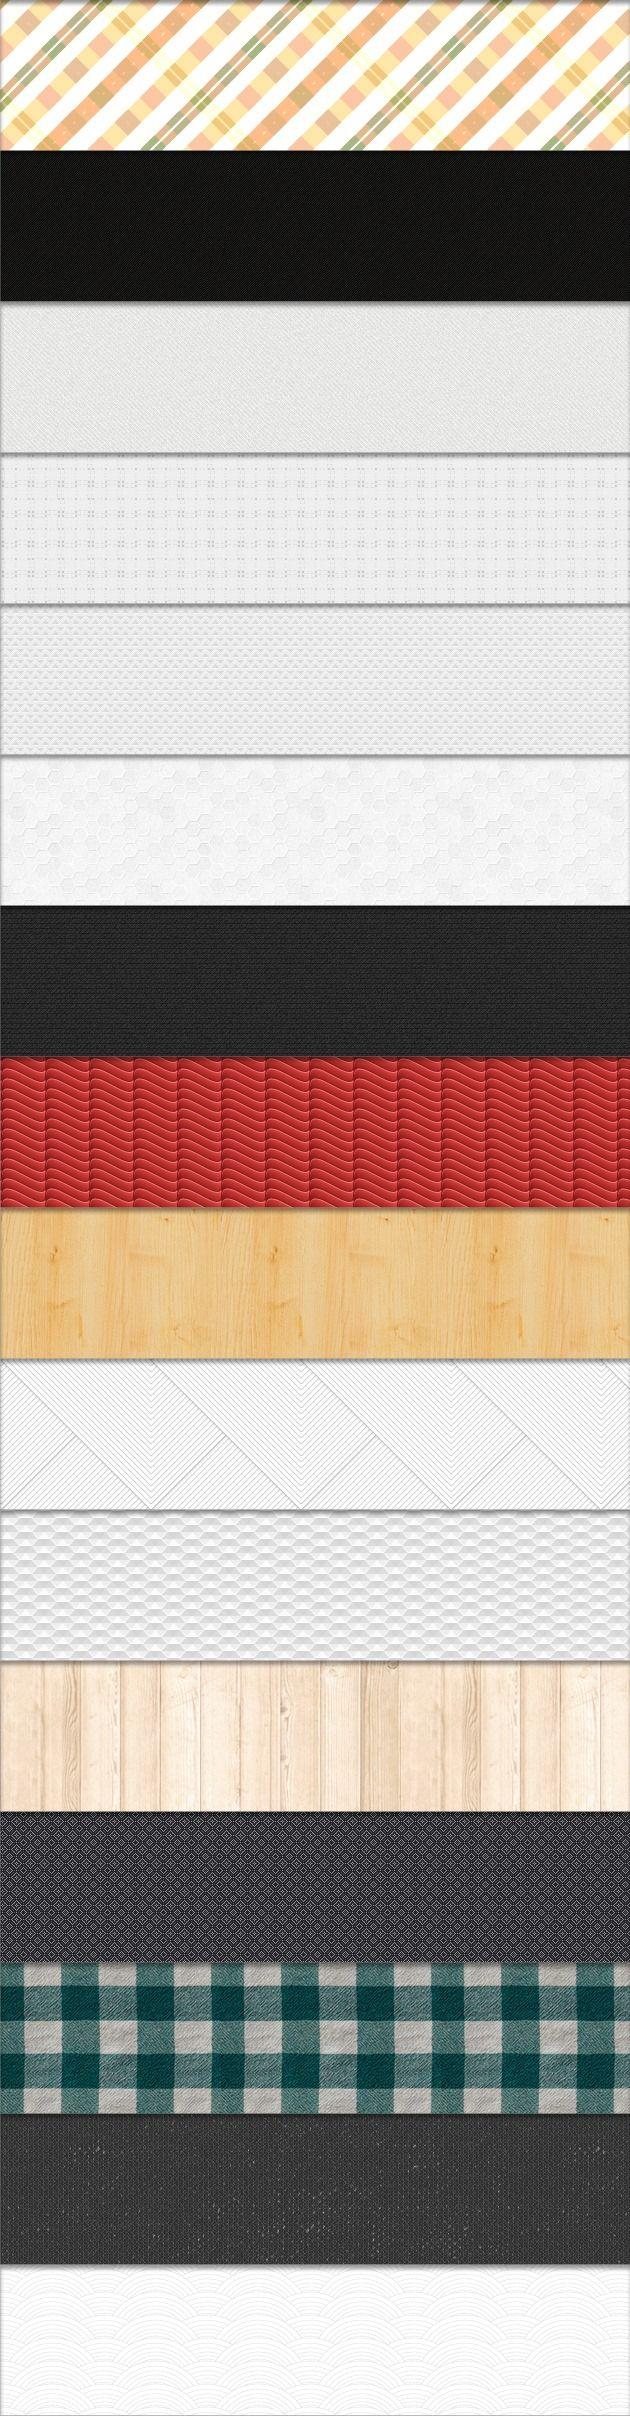 Free Vectors - 300 seamless patterns